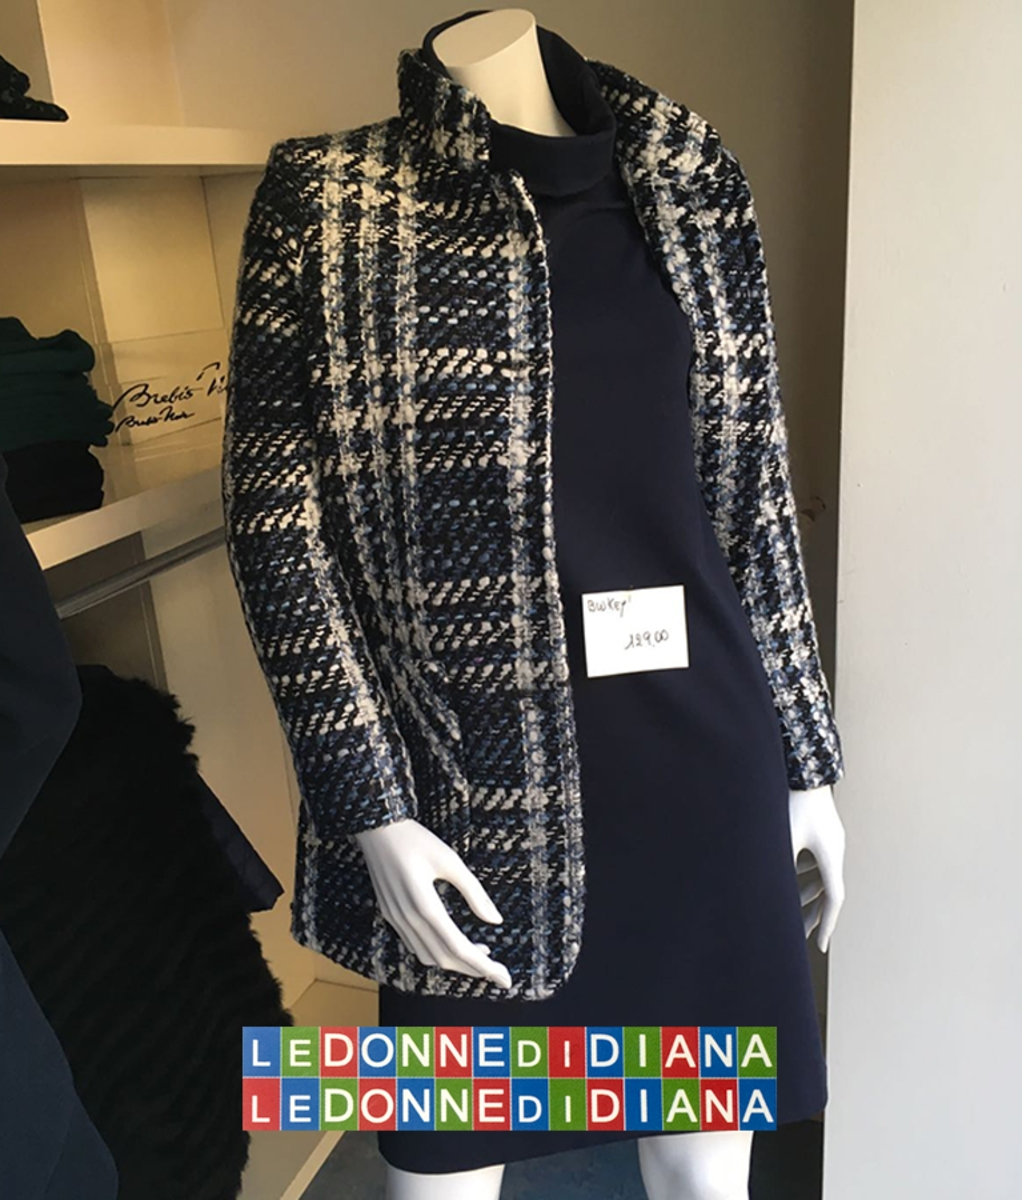 00-donne-diana